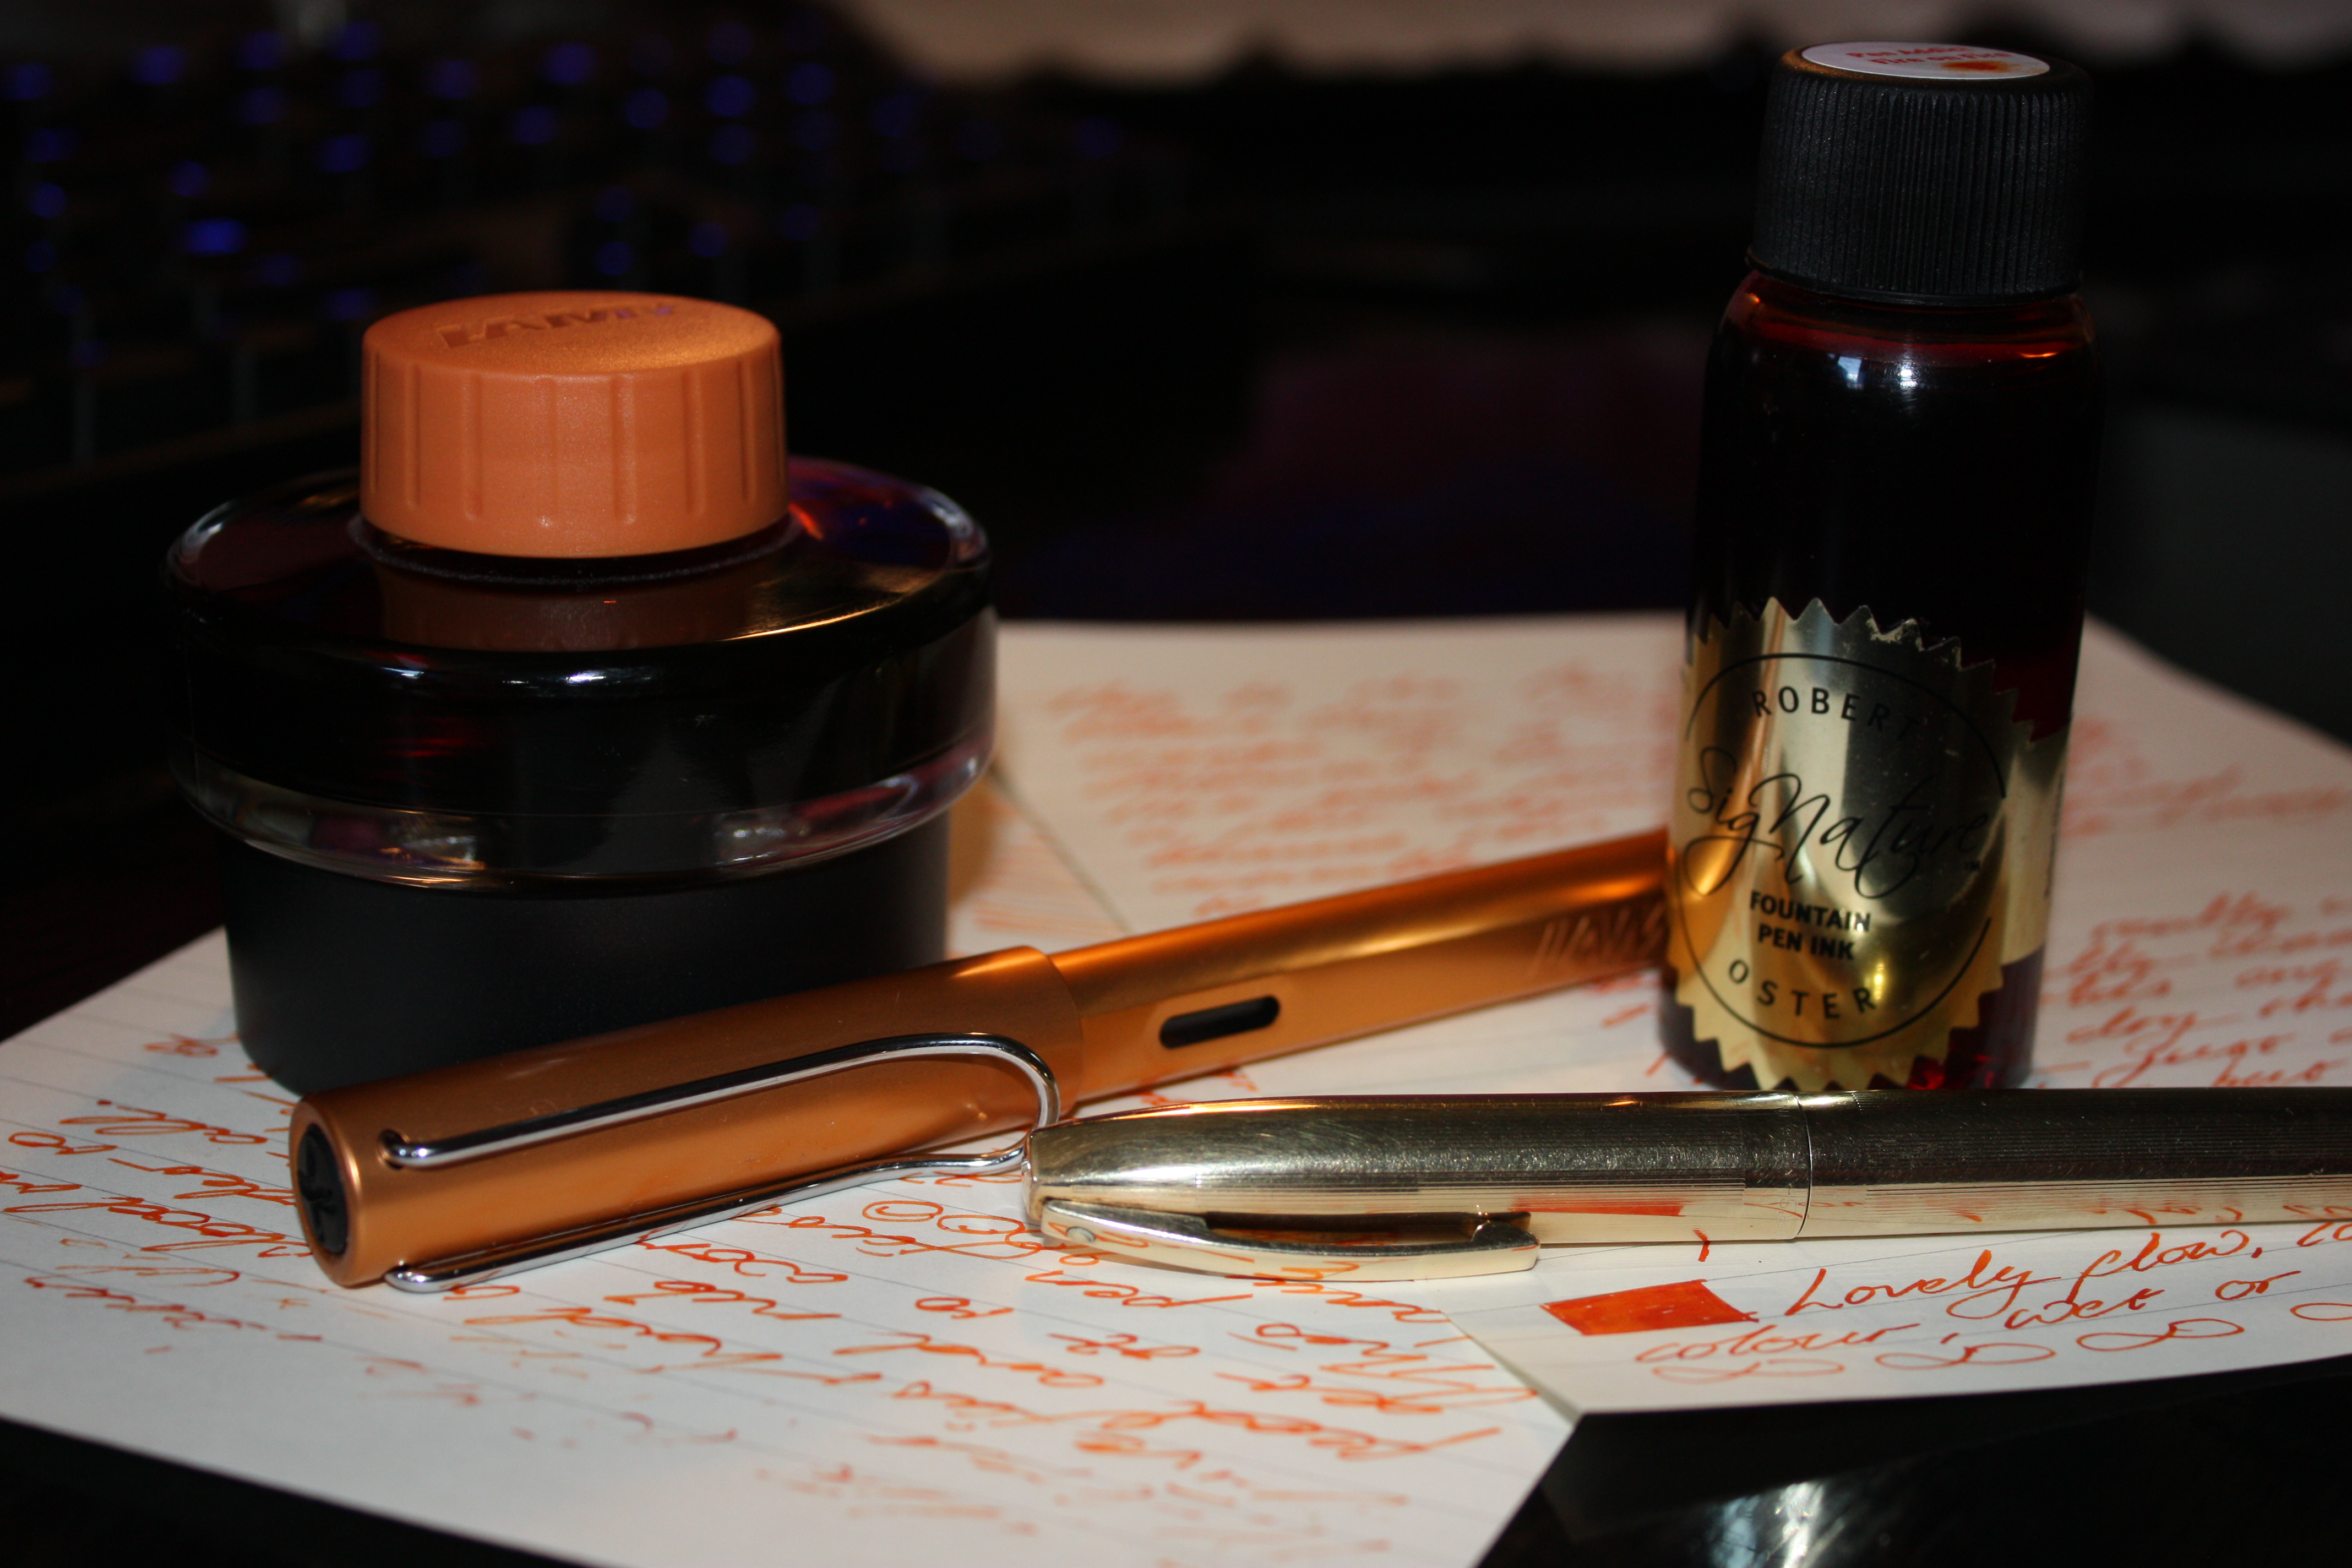 The Pen Addict vs. Lamy Shootout—Brad's on Fire!